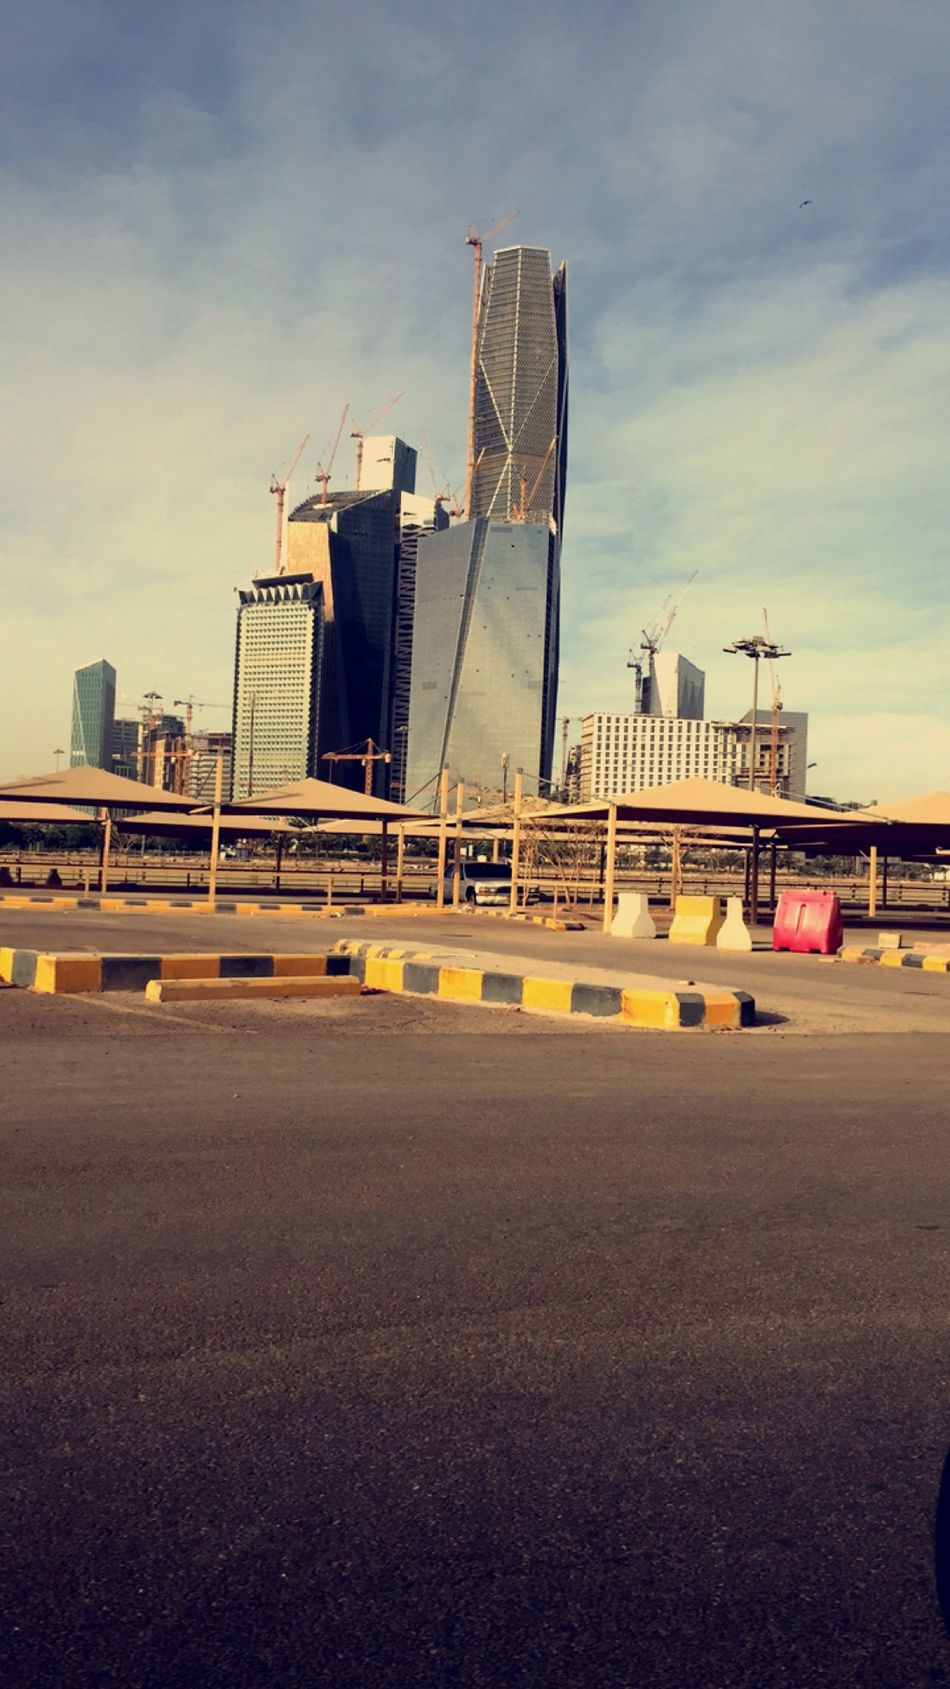 Relaxing Riyadh Taking Photos تصويري  People Watching Doha,Qatar Saudi Arabia